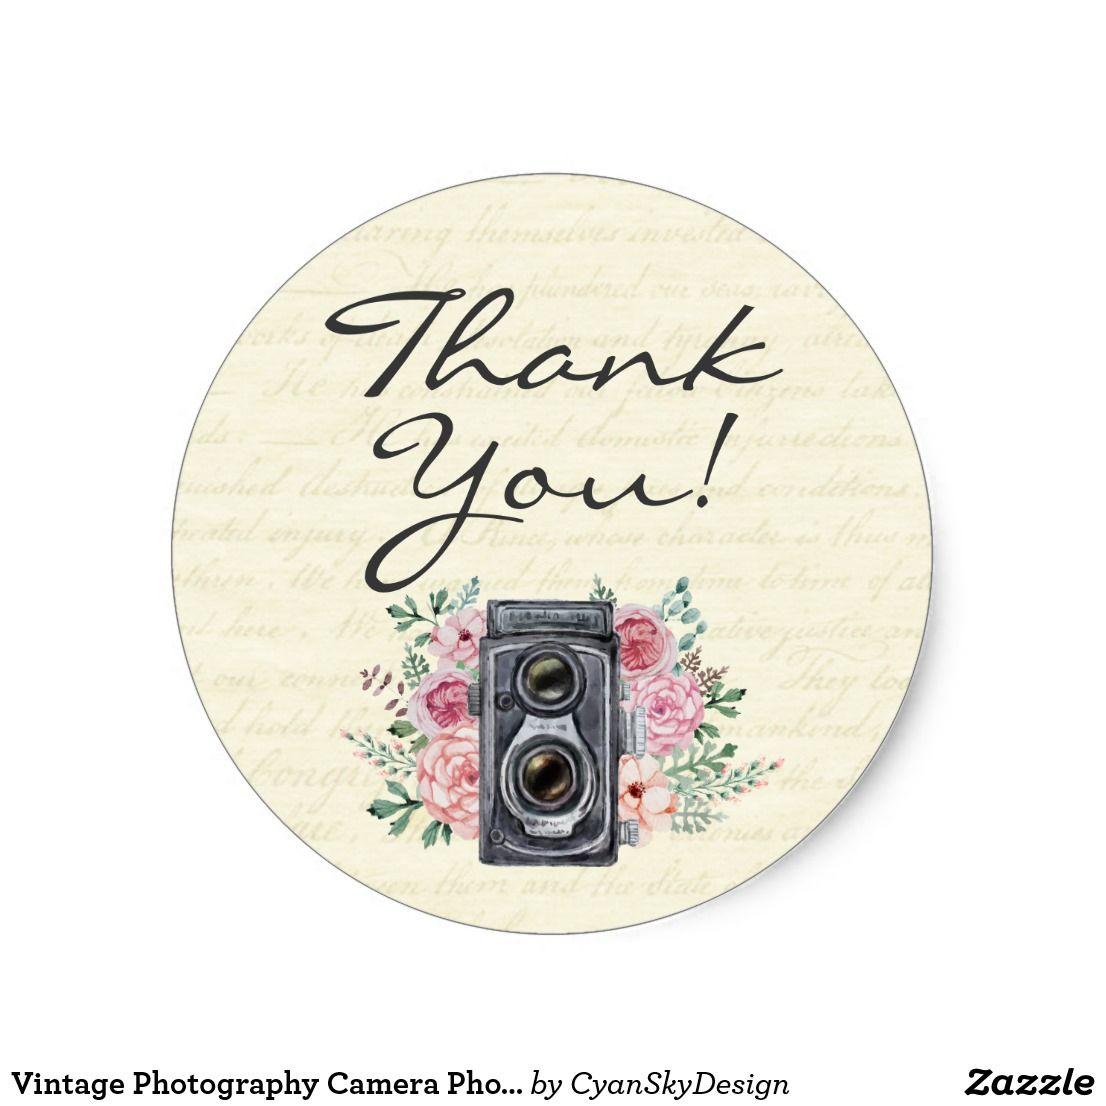 Thank you photographer